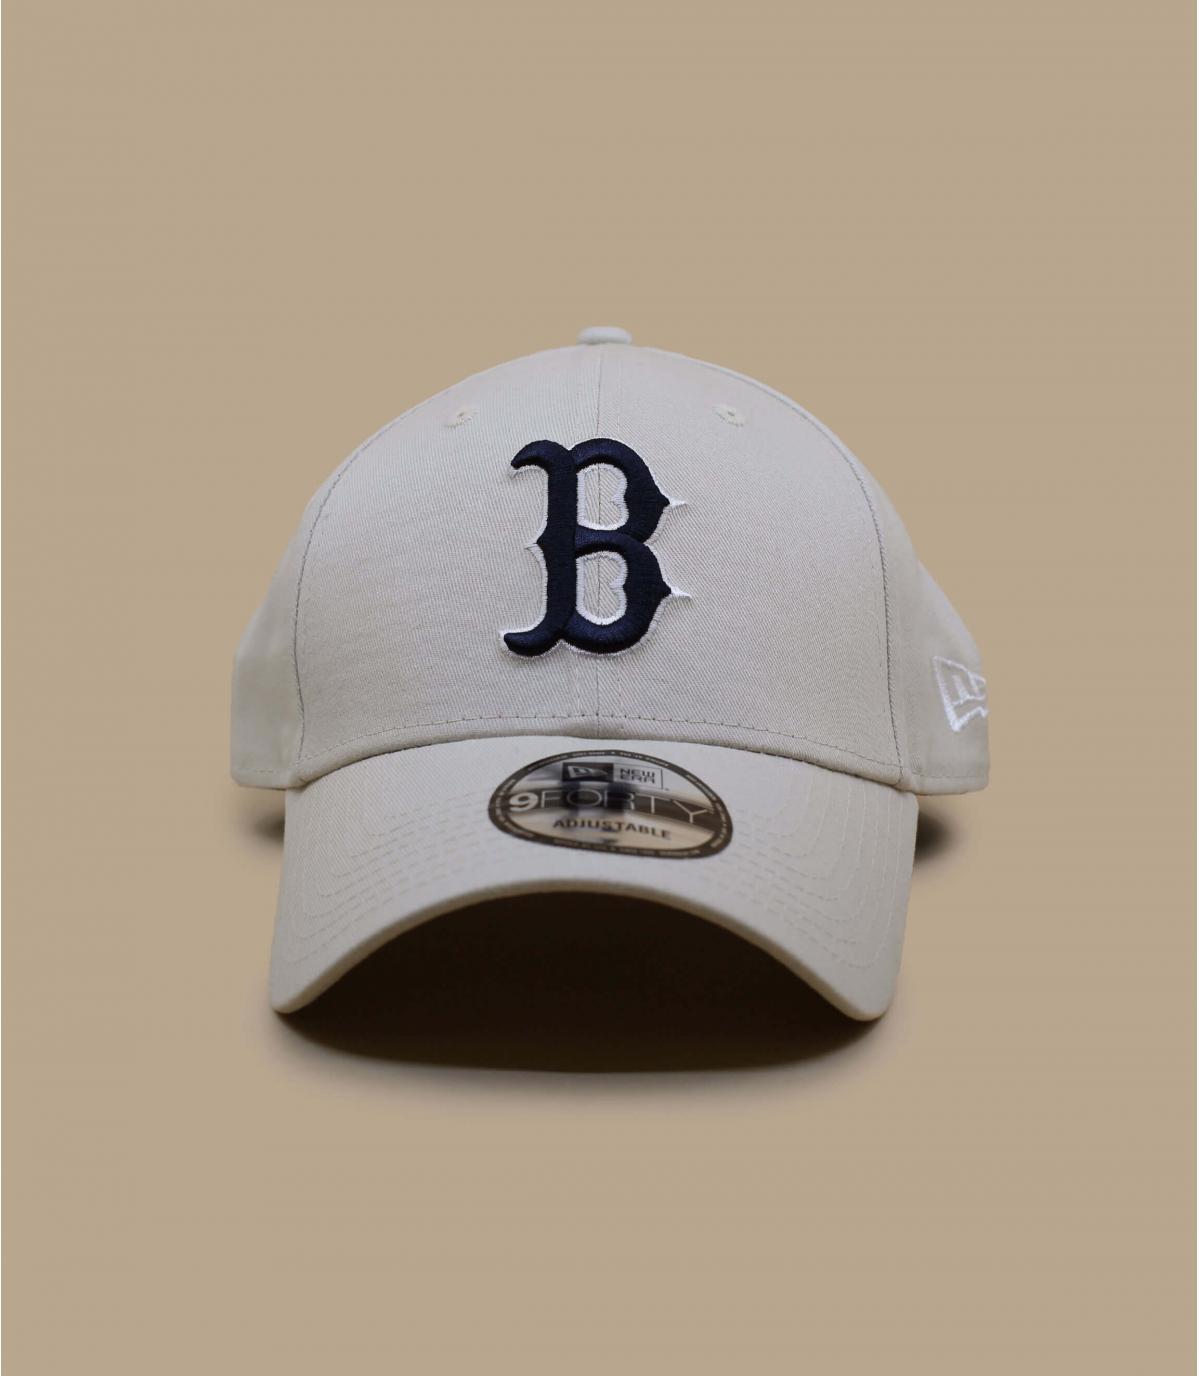 Details Cap League Ess 940 Boston stone navy - Abbildung 2